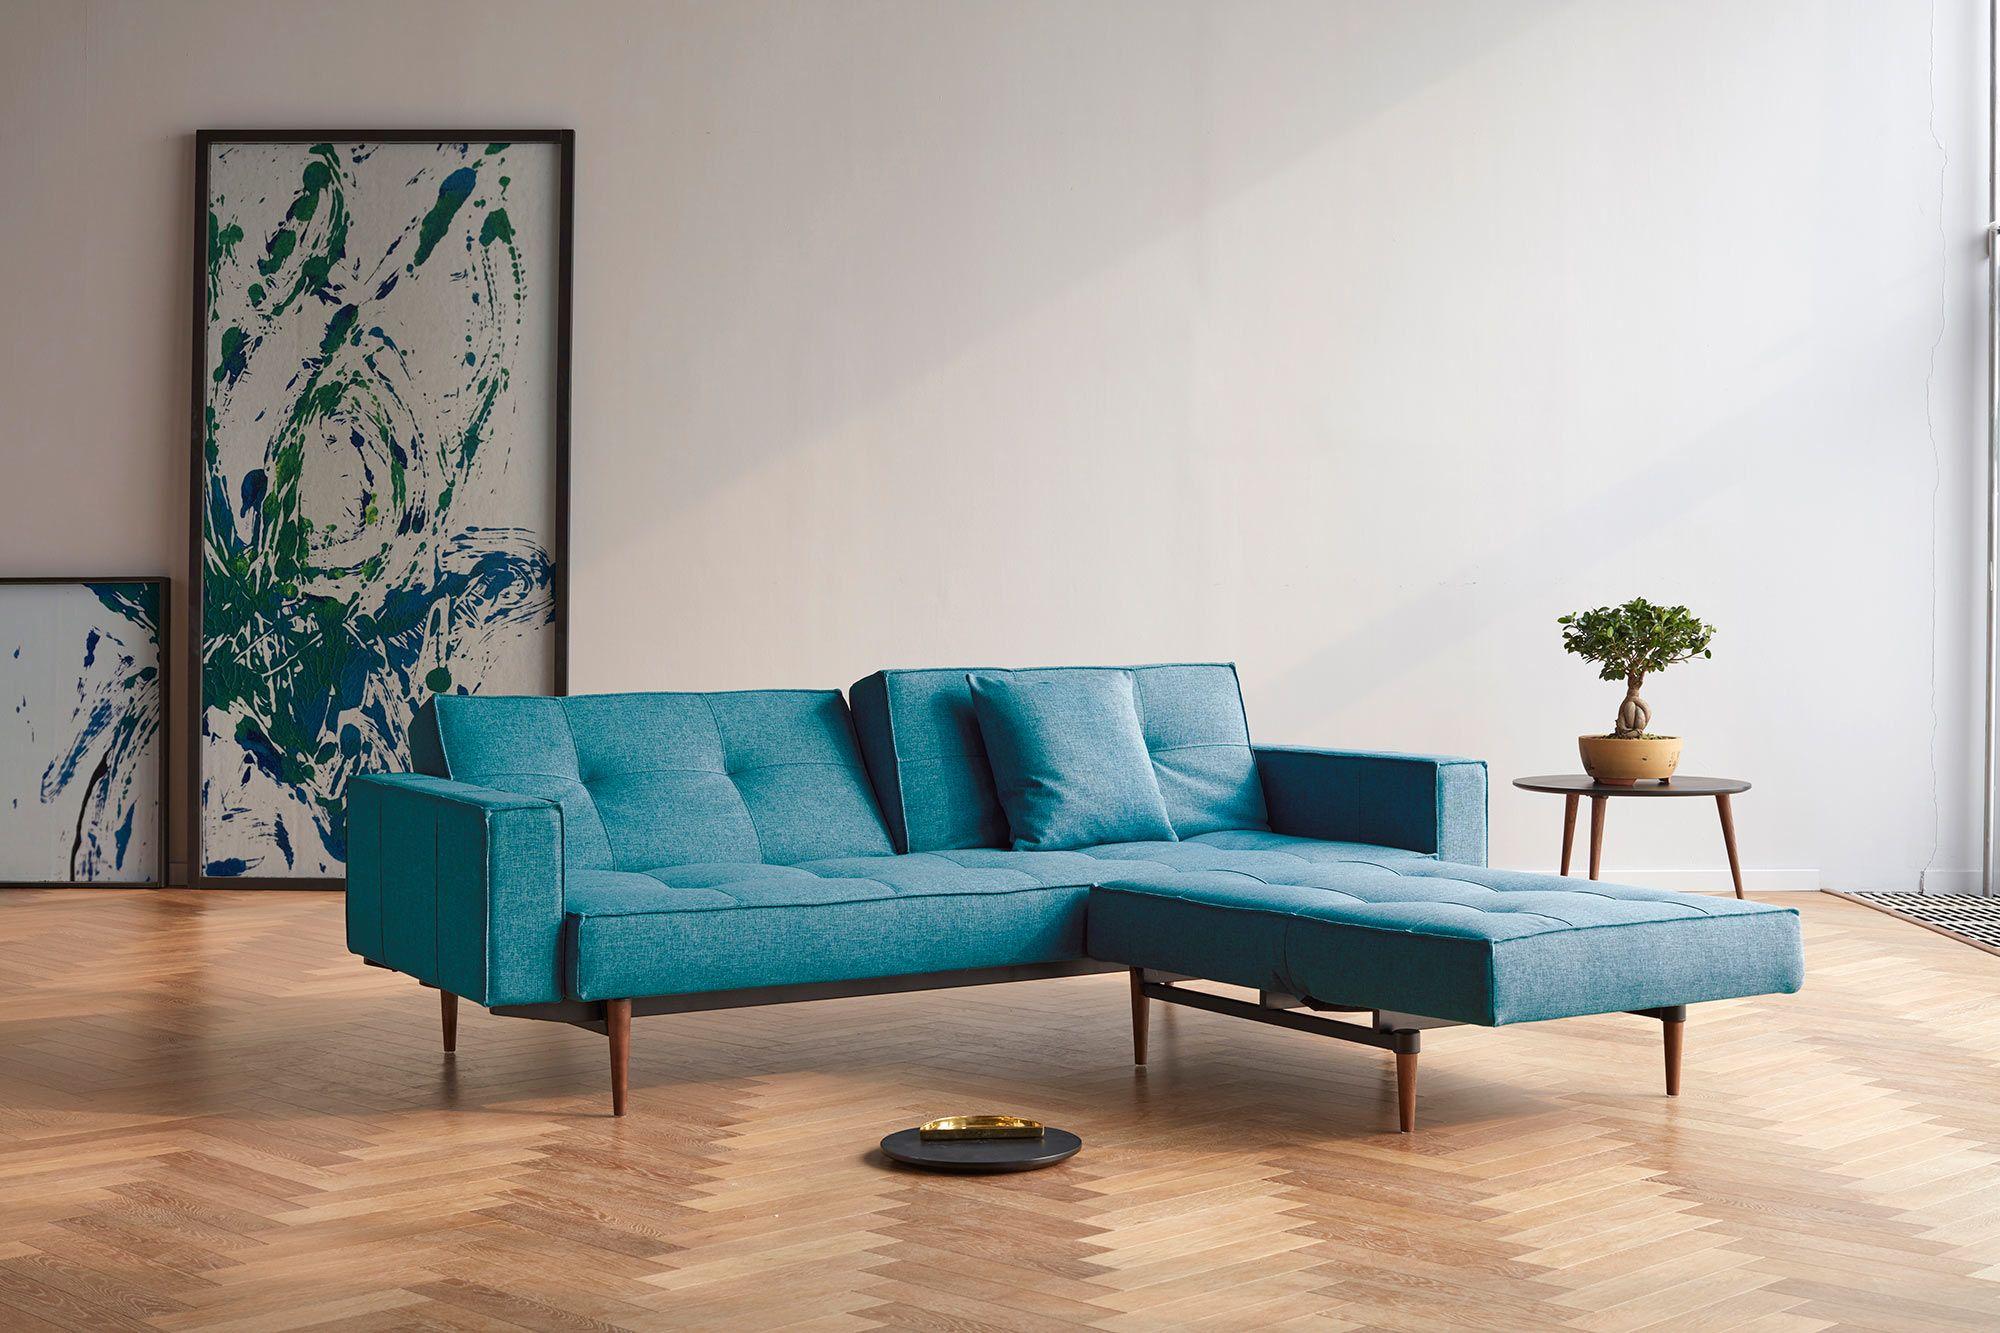 INNOVATION Modular Sofas and Chairs